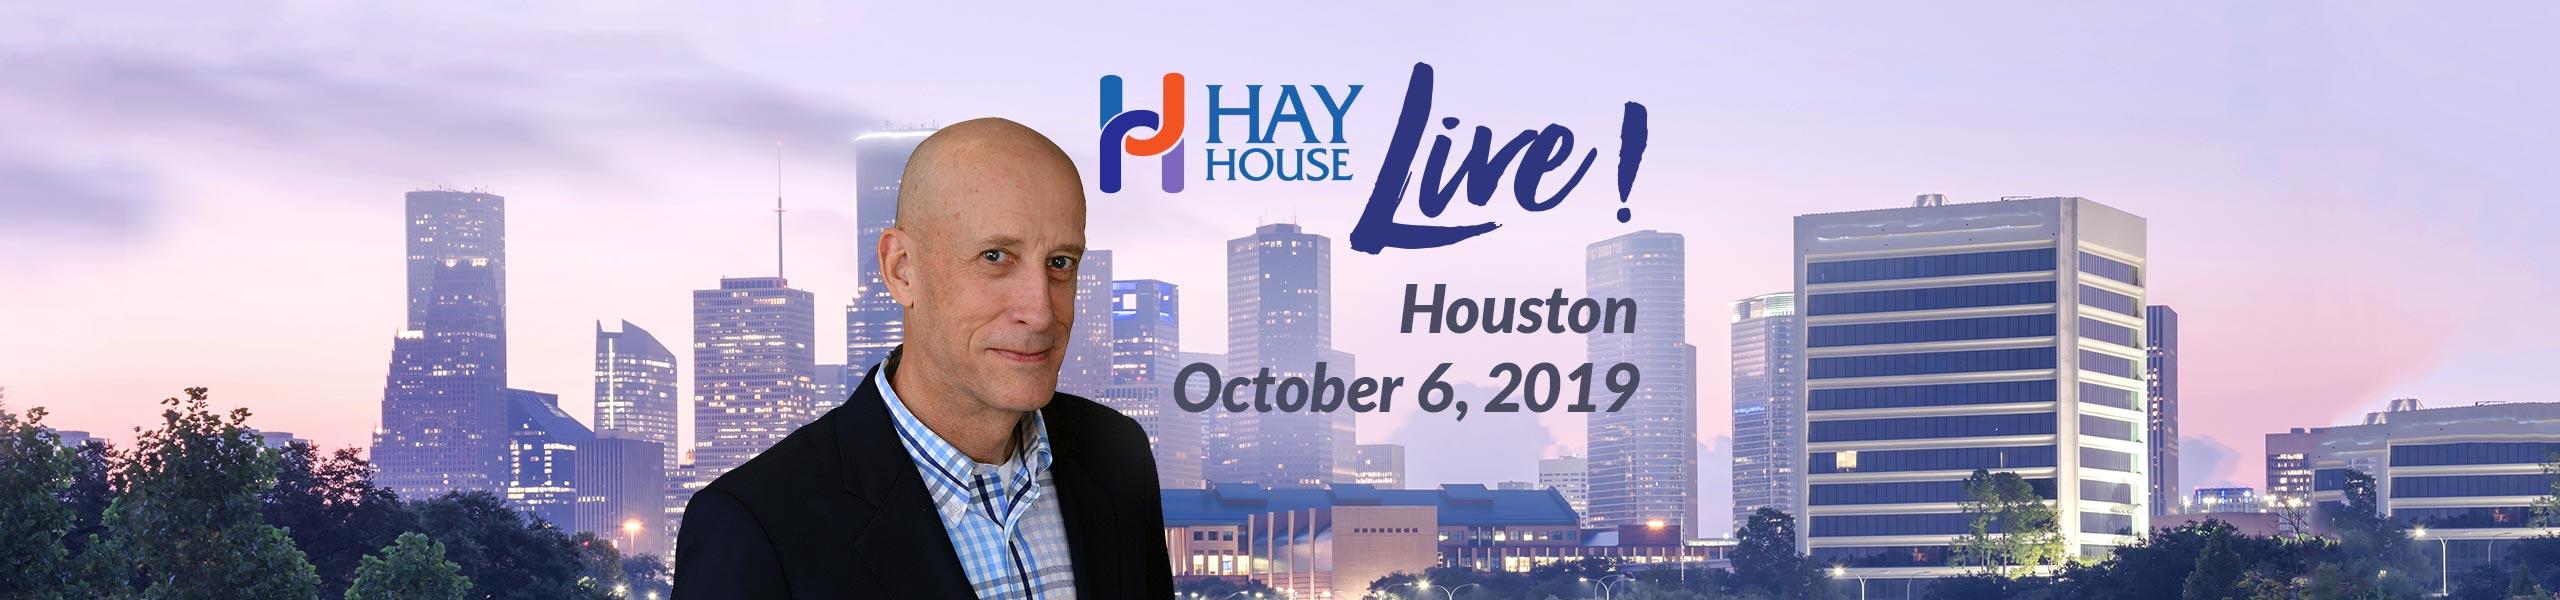 Hay House Live! Houston 2019 - Mike Dooley